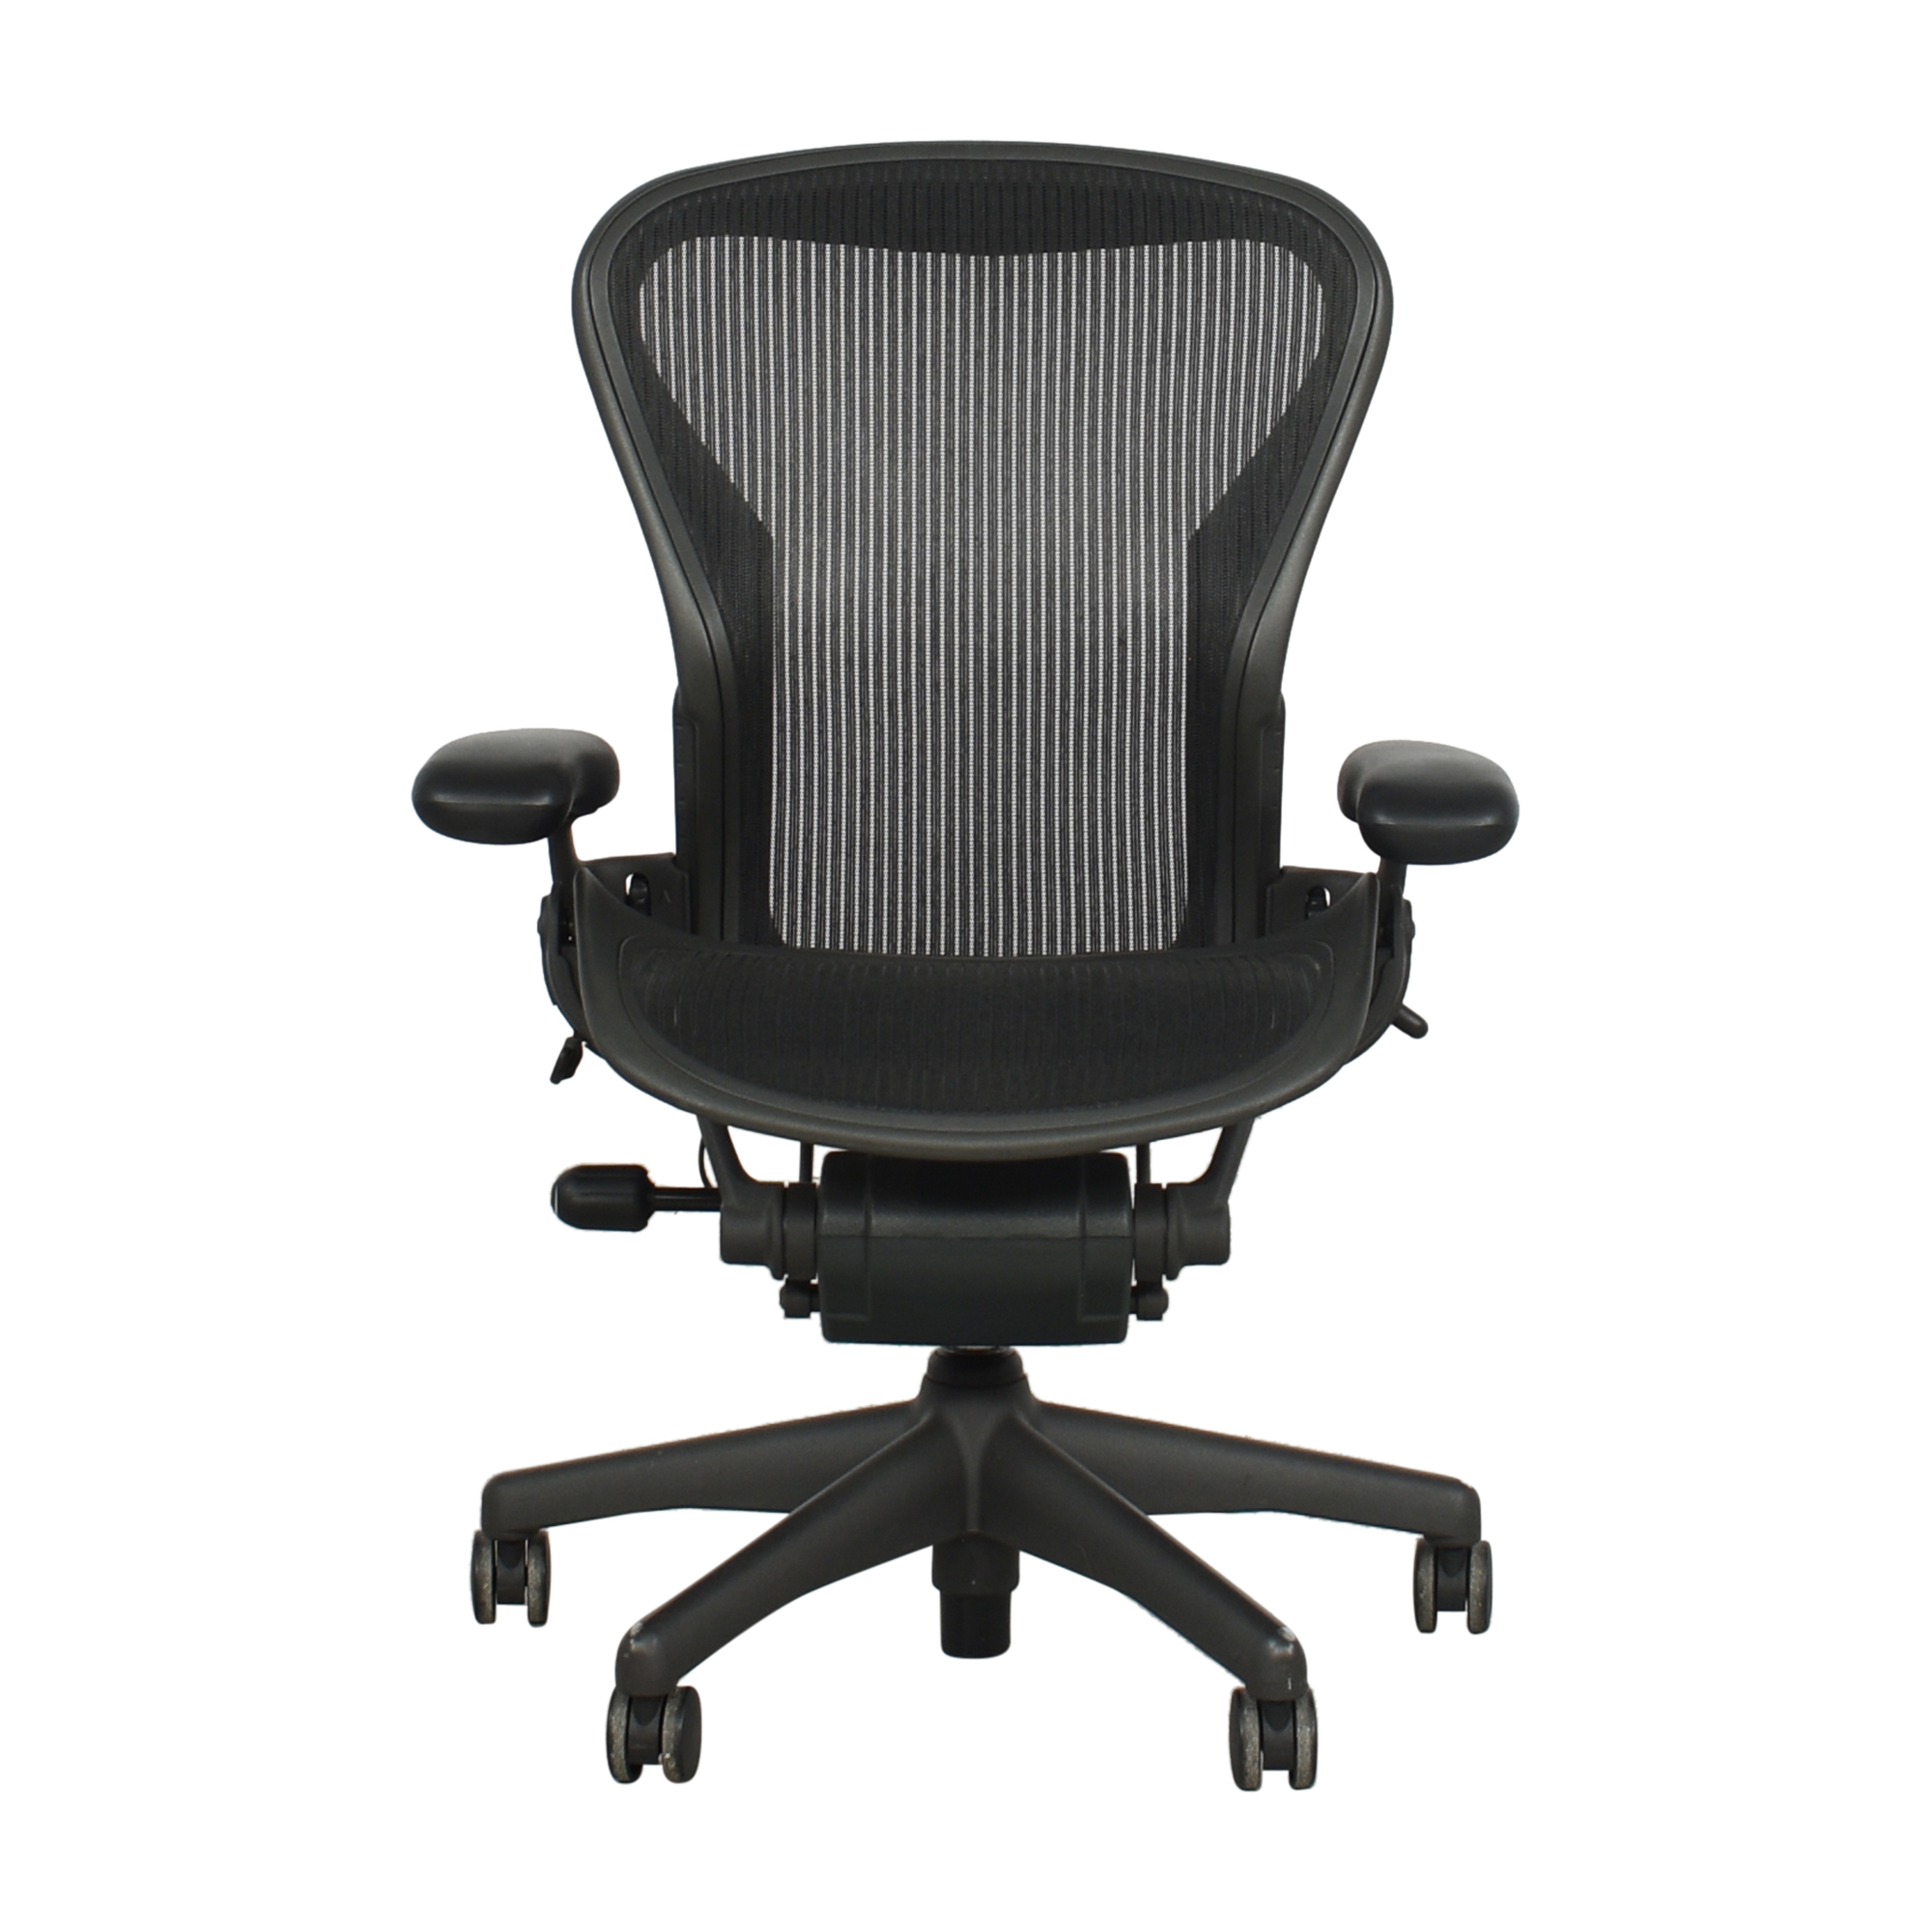 shop Herman Miller Herman Miller Aeron Size B Office Chair online